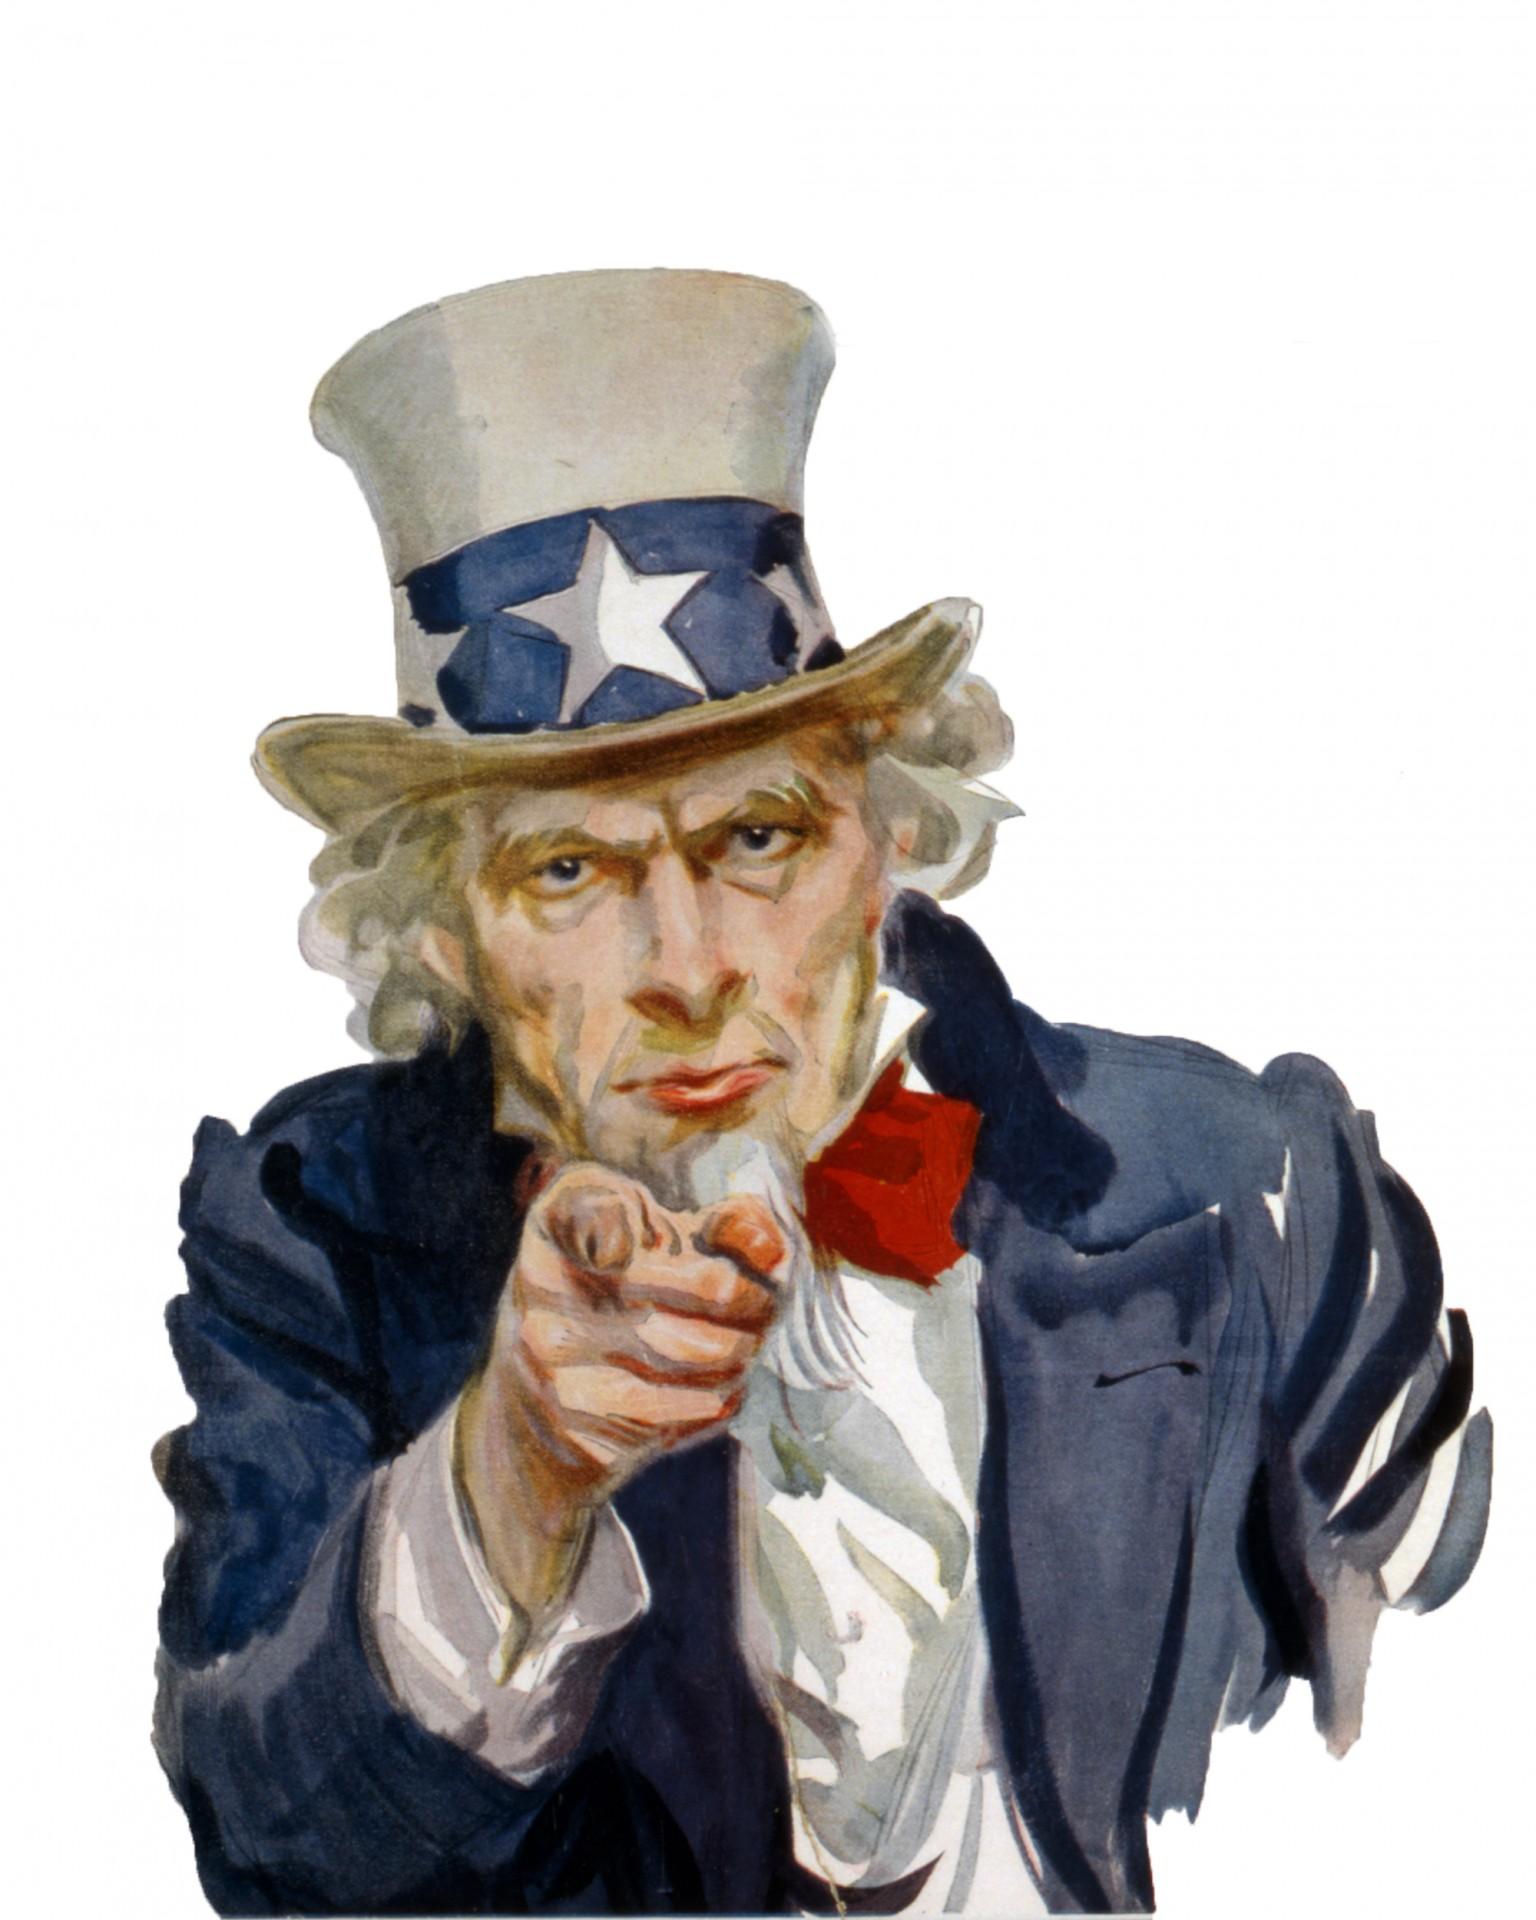 uncle sam i want you png transparent uncle sam i want you uncle sam pointing finger clipart uncle sam pointing finger clipart